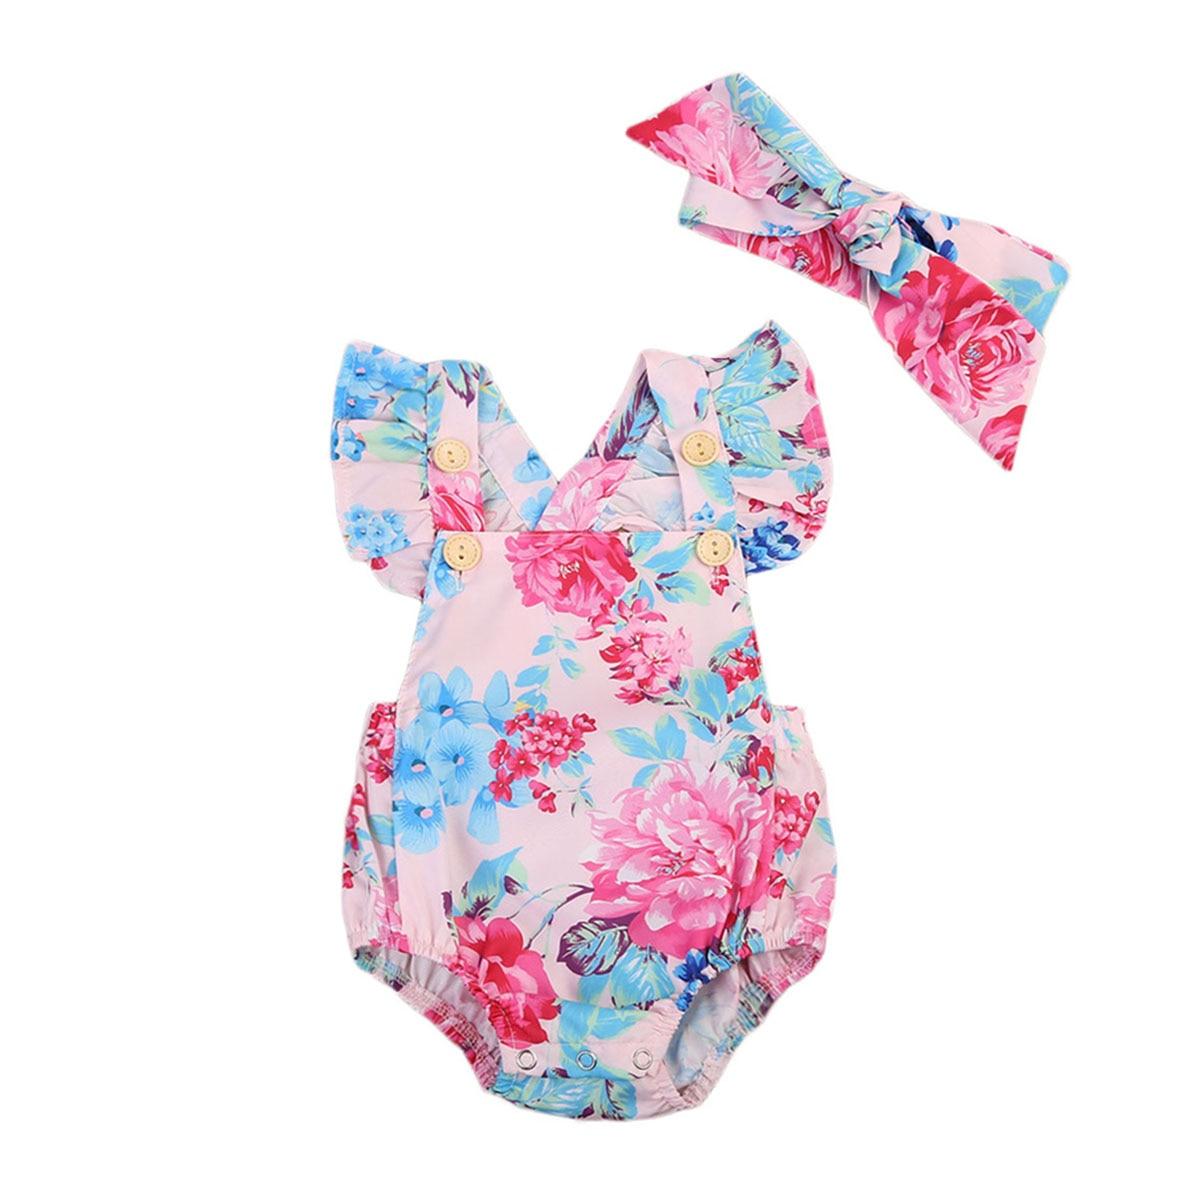 2017 Cute Summer Newborn Infant Baby Girls Sleeveless Floral Romper Jumpsuit Sunsuit Headbands 2Pcs Outfits Set